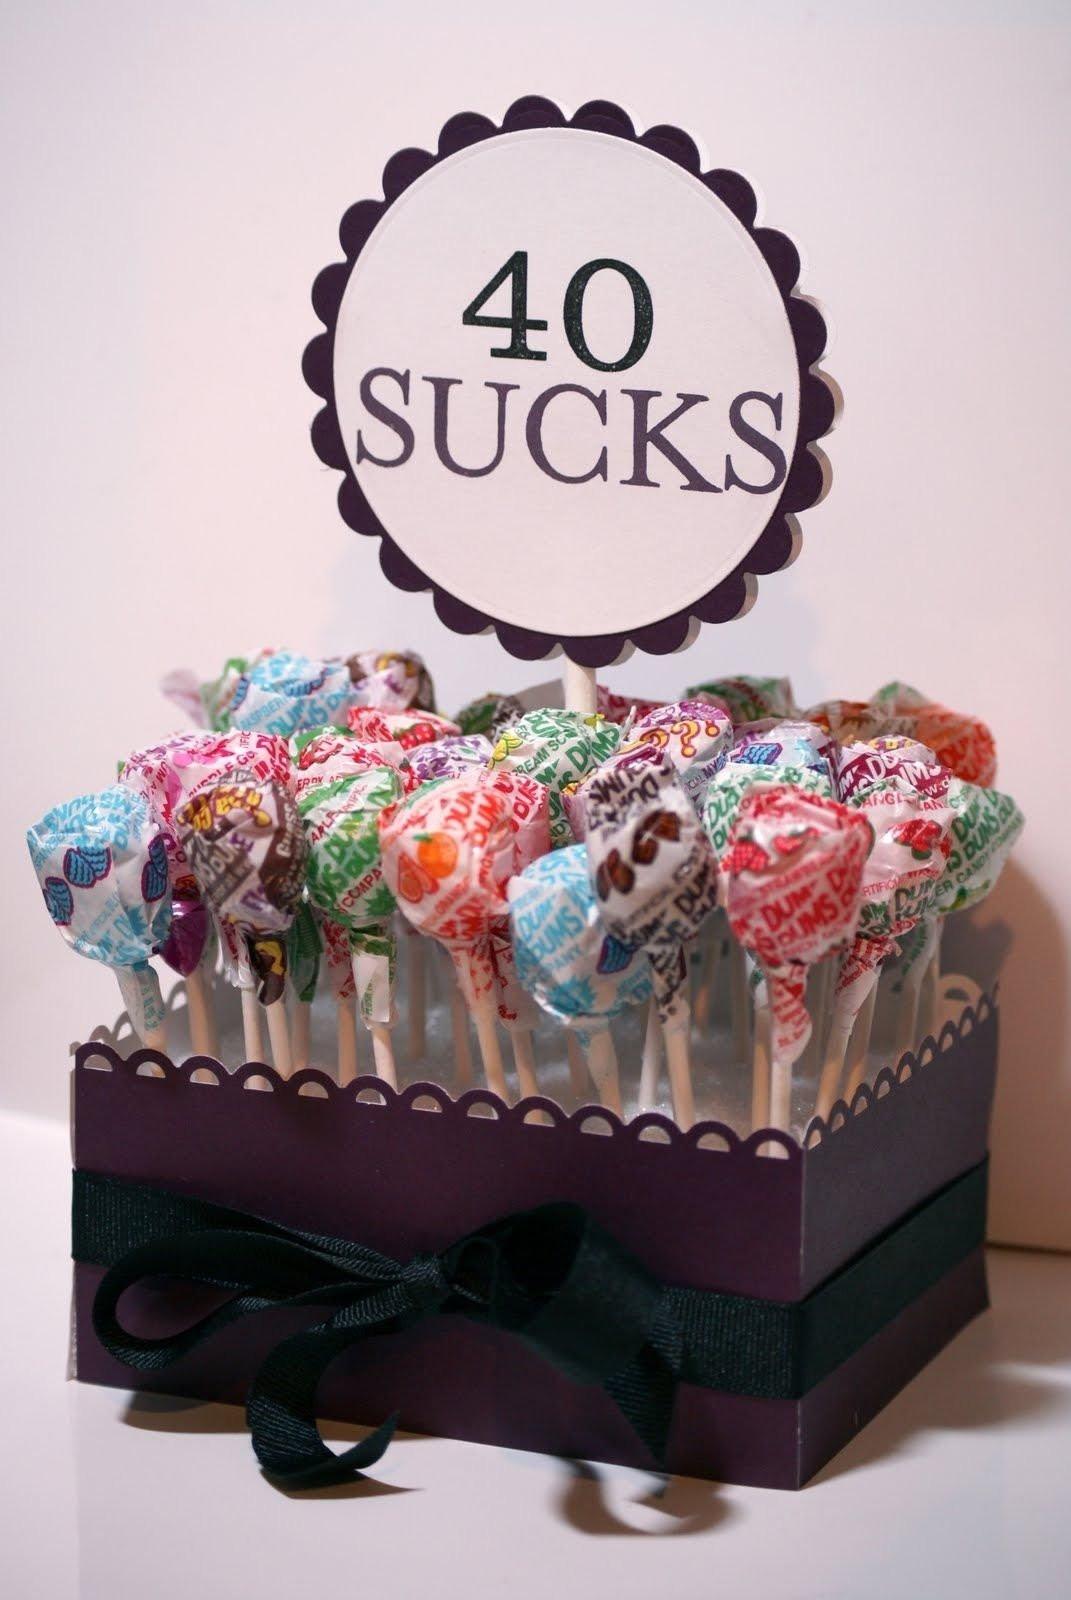 40Th Birthday Gag Gift Ideas  10 Stunning Funny 40Th Birthday Gift Ideas 2019